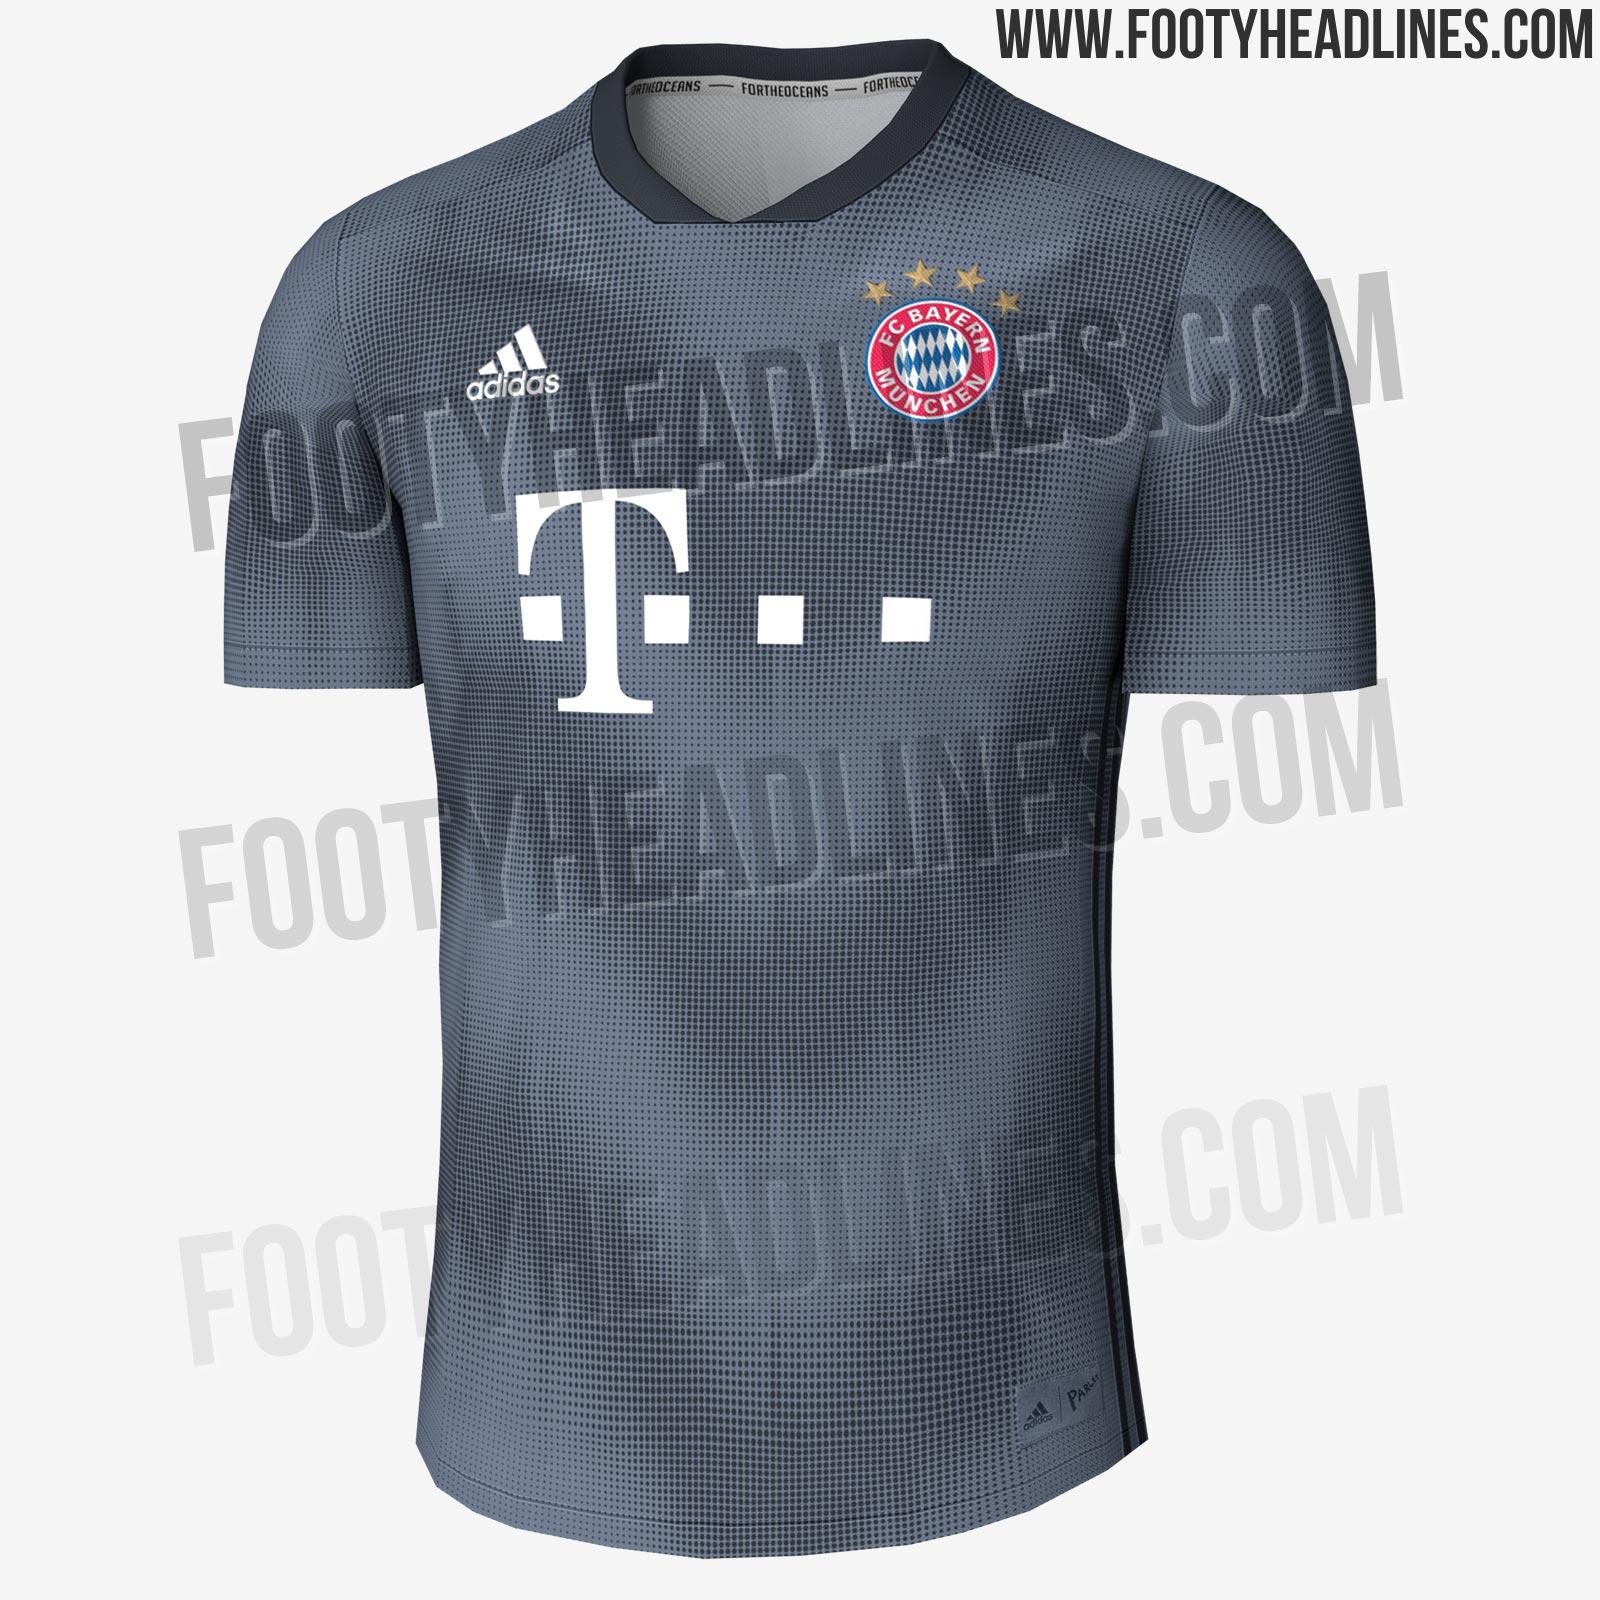 Kits by BK-201 ::NO REQUESTS:: - Page 8 Bayern-munich-18-19-third-kit-3